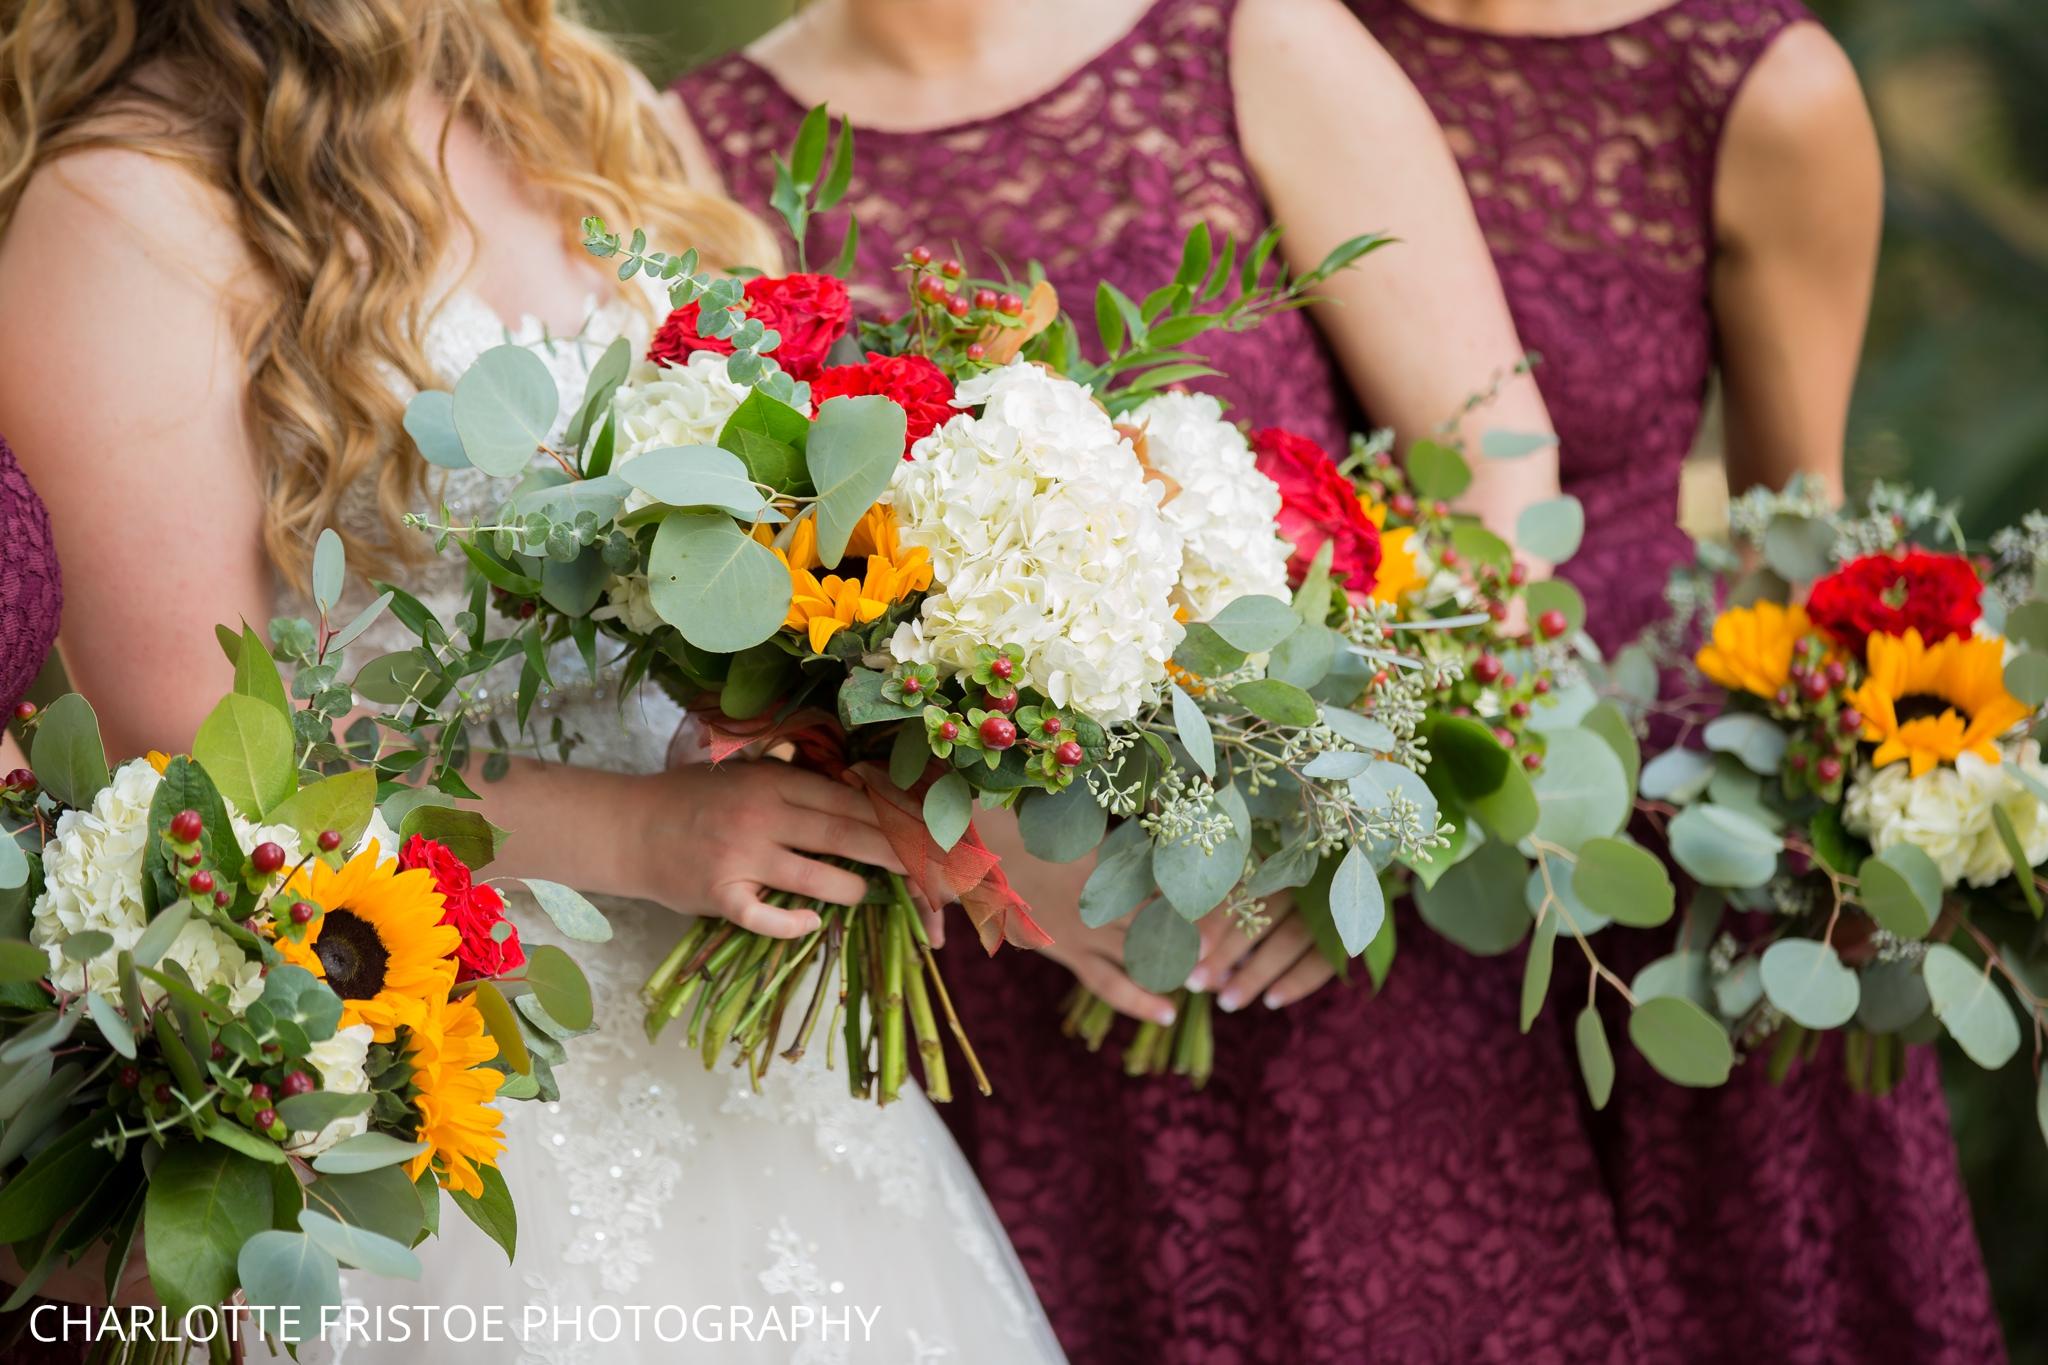 Tallahassee_Wedding_Charlotte_Fristoe-11.jpg